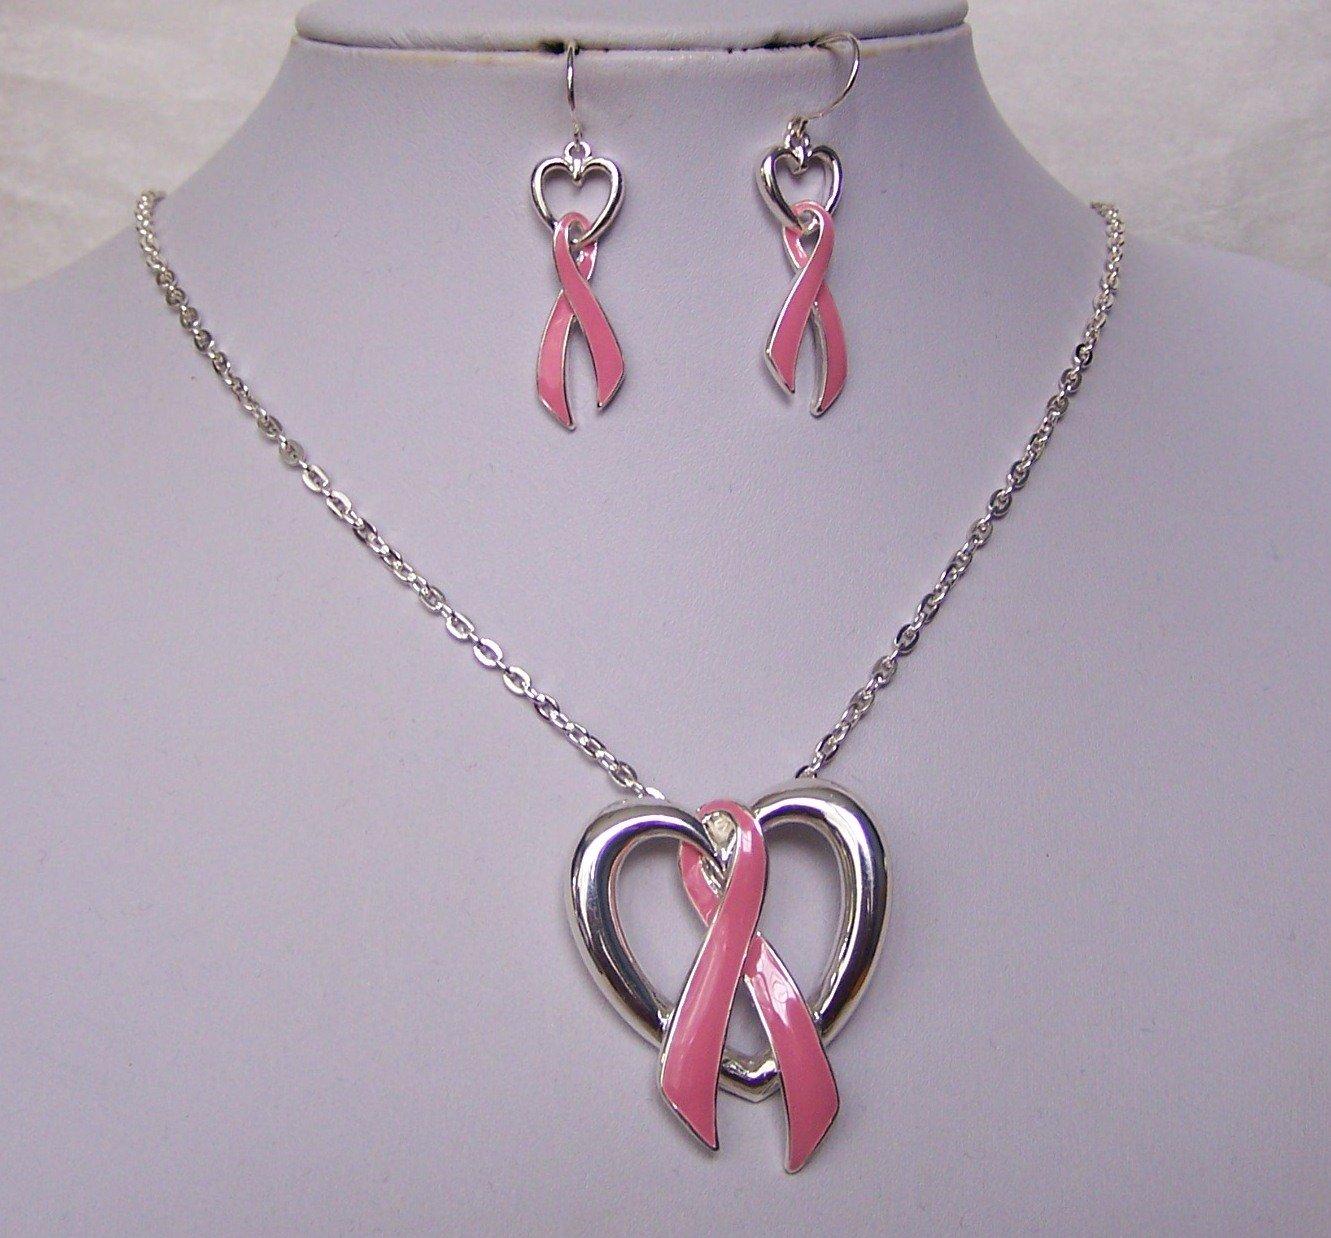 Pink Ribbon Breast Cancer Awareness Necklace Set